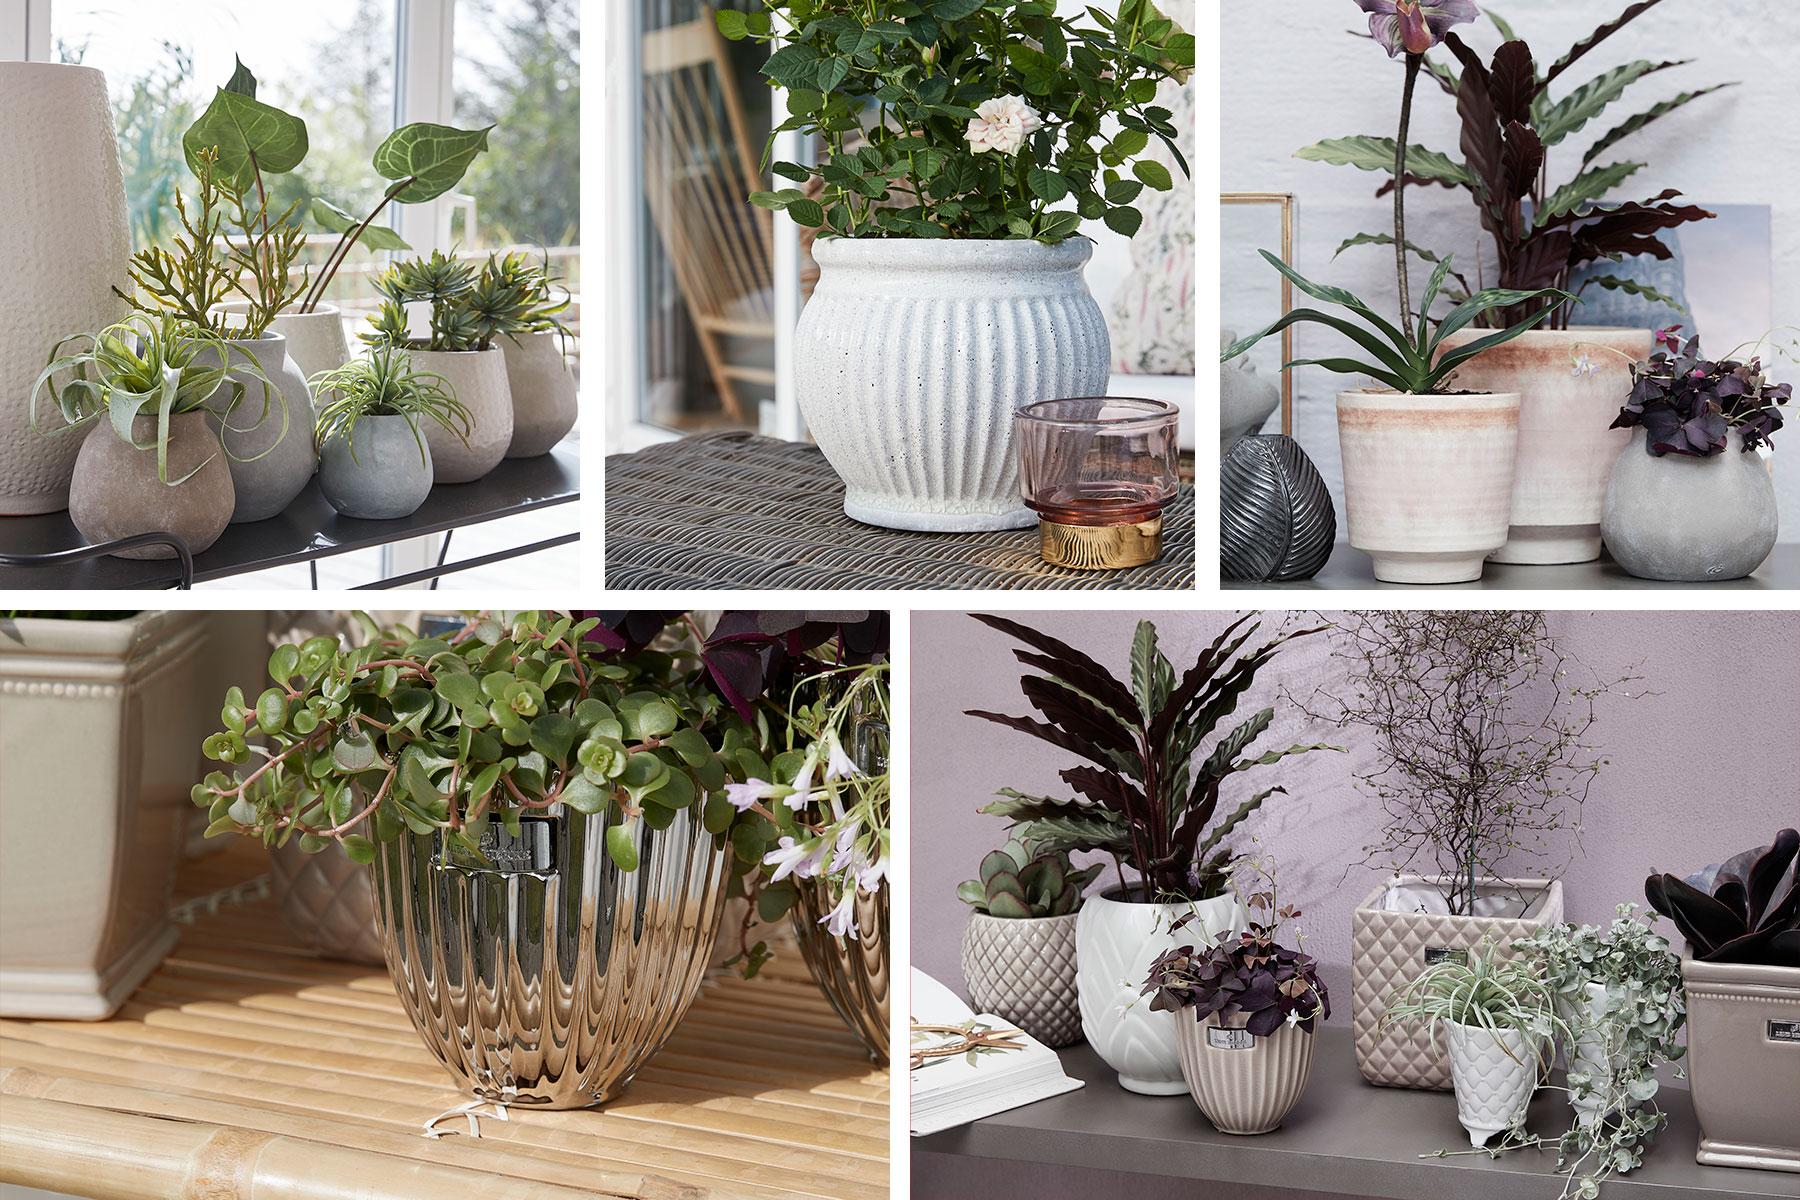 Scandinavian home decor wholesaler of flower pots - Lene Bjerre